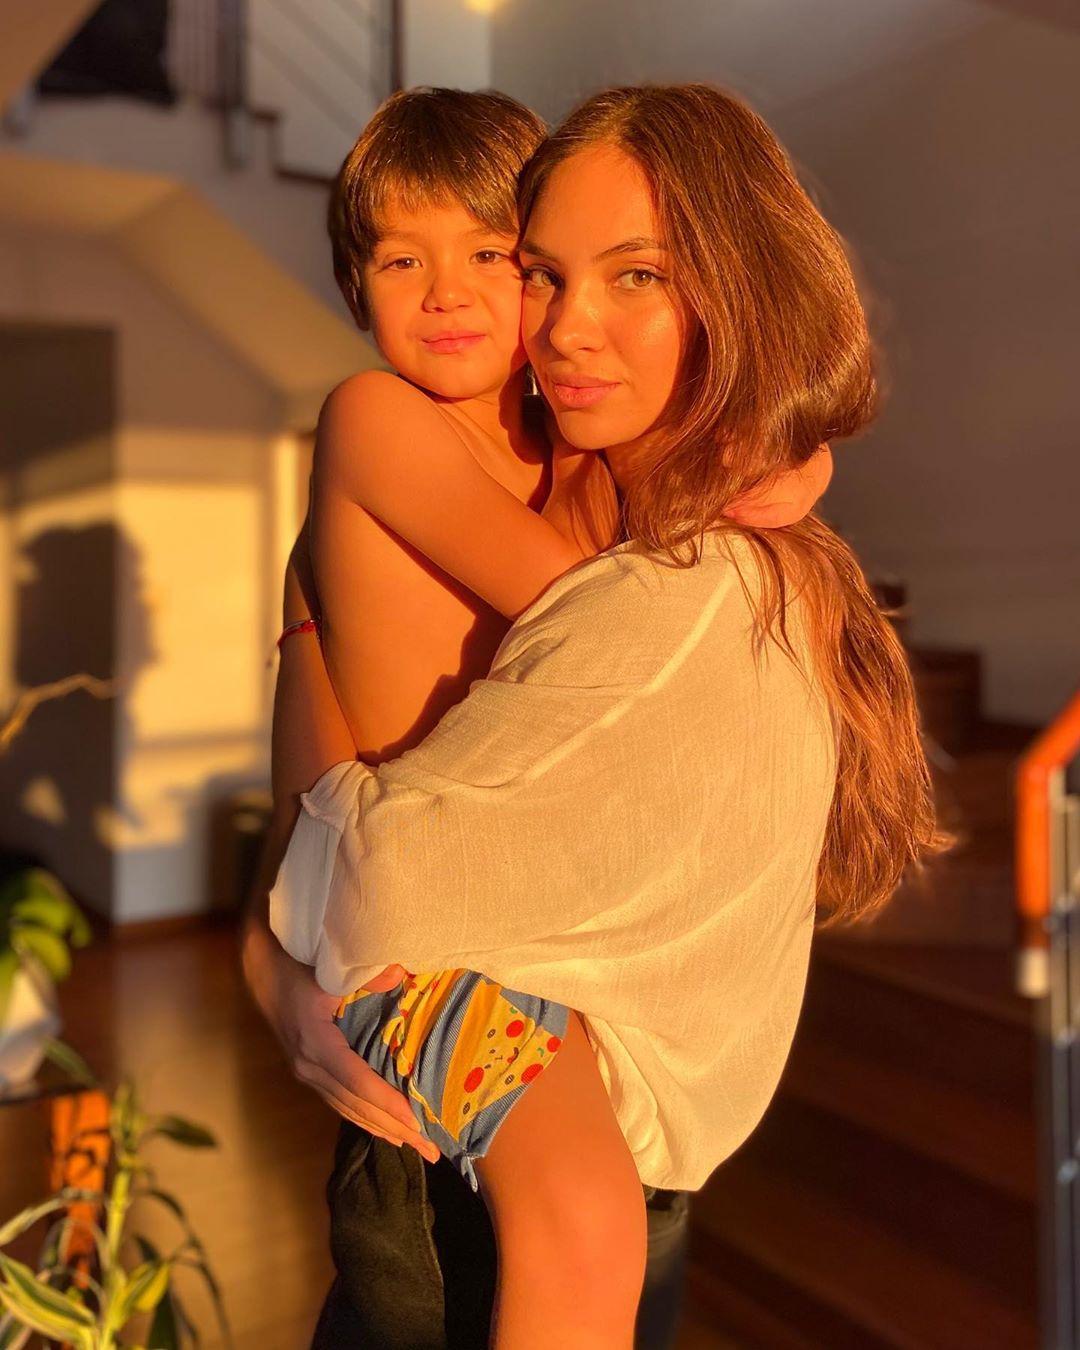 natalie vertiz, miss peru universe 2011. particpo de nb latina 2010 & latin model 2010 (season 3). - Página 16 93359010